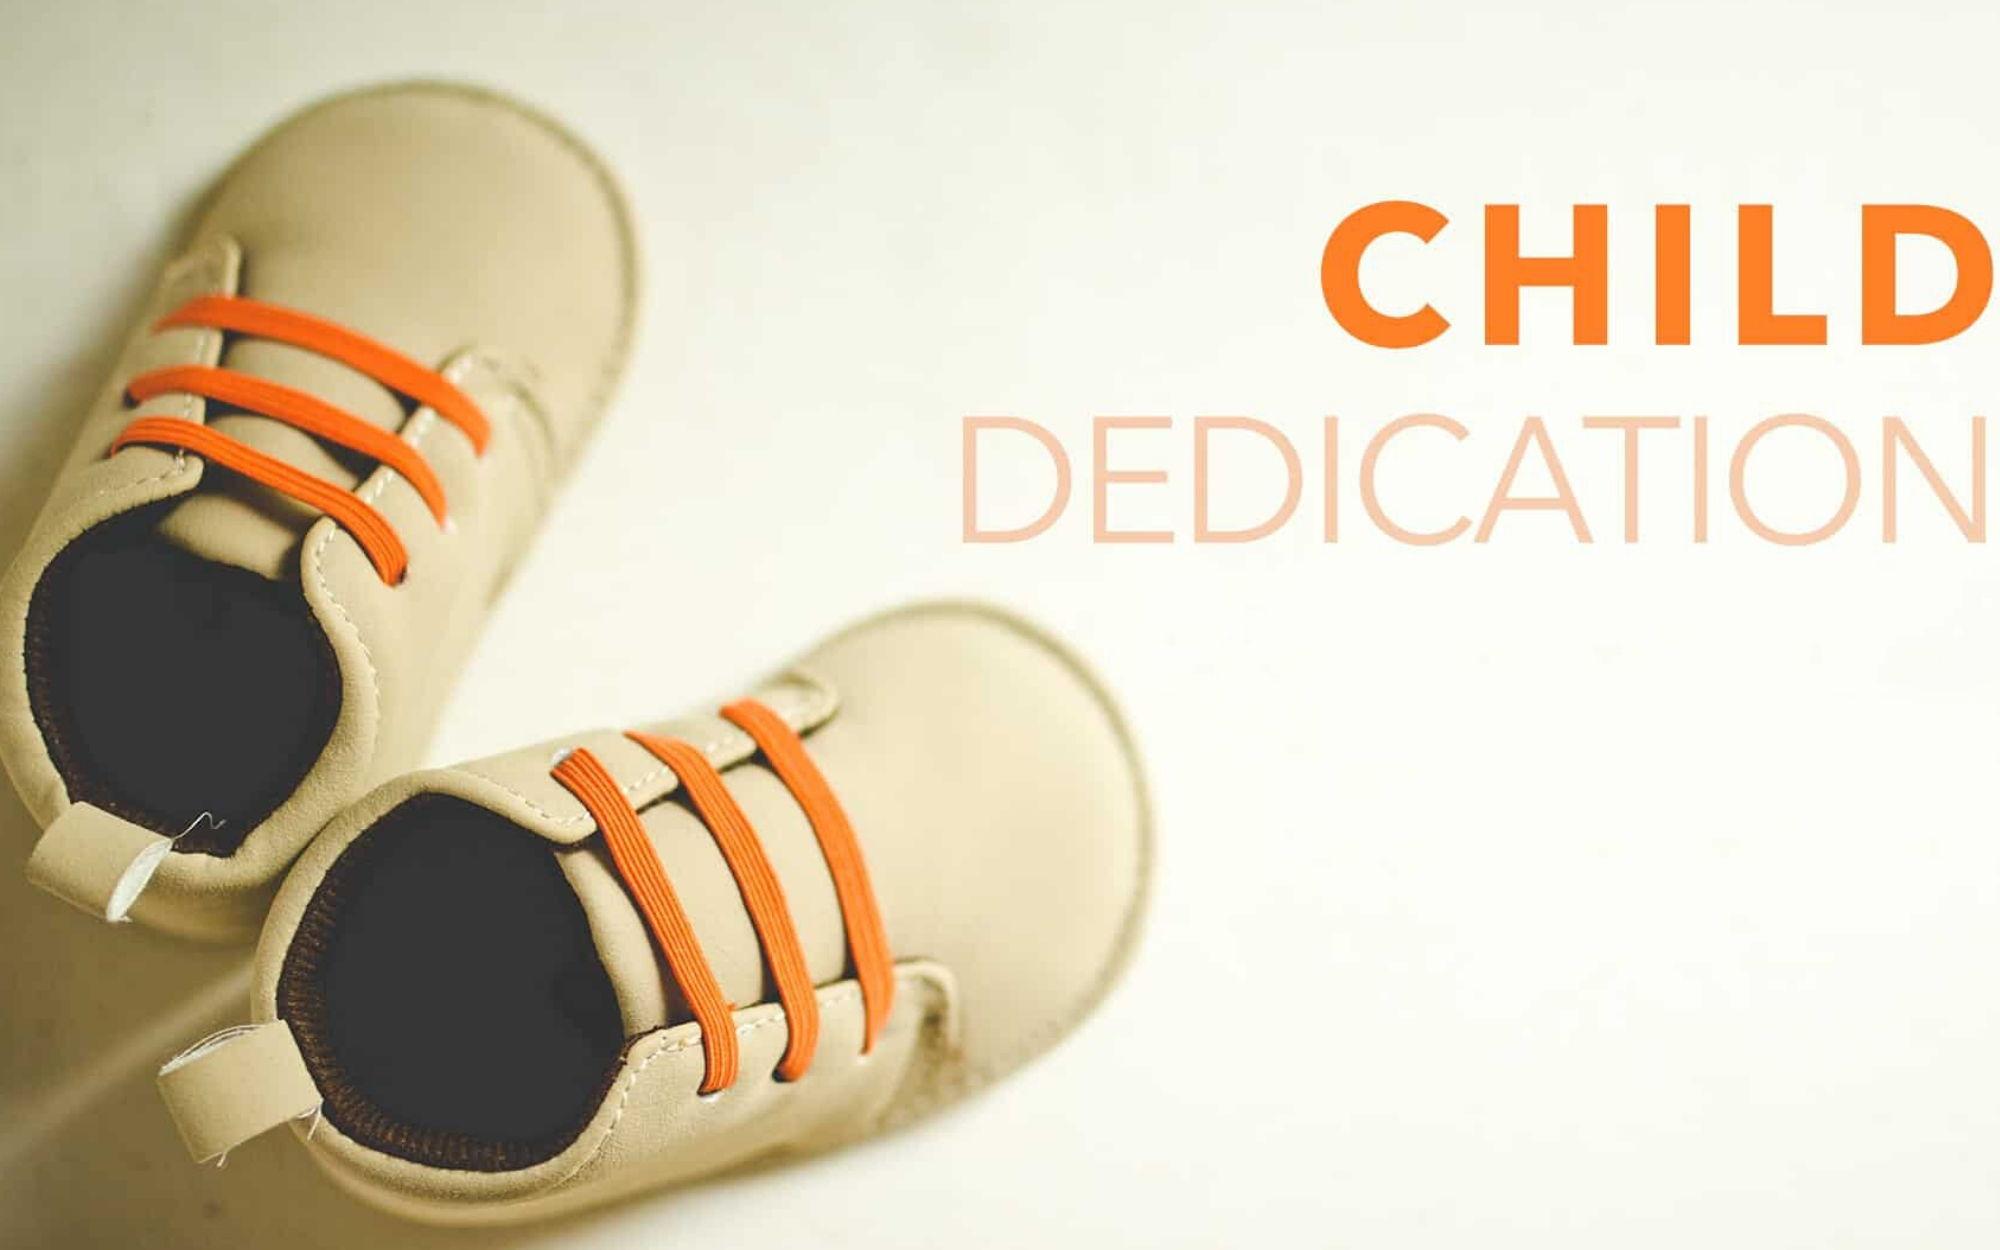 Image for Child Dedication